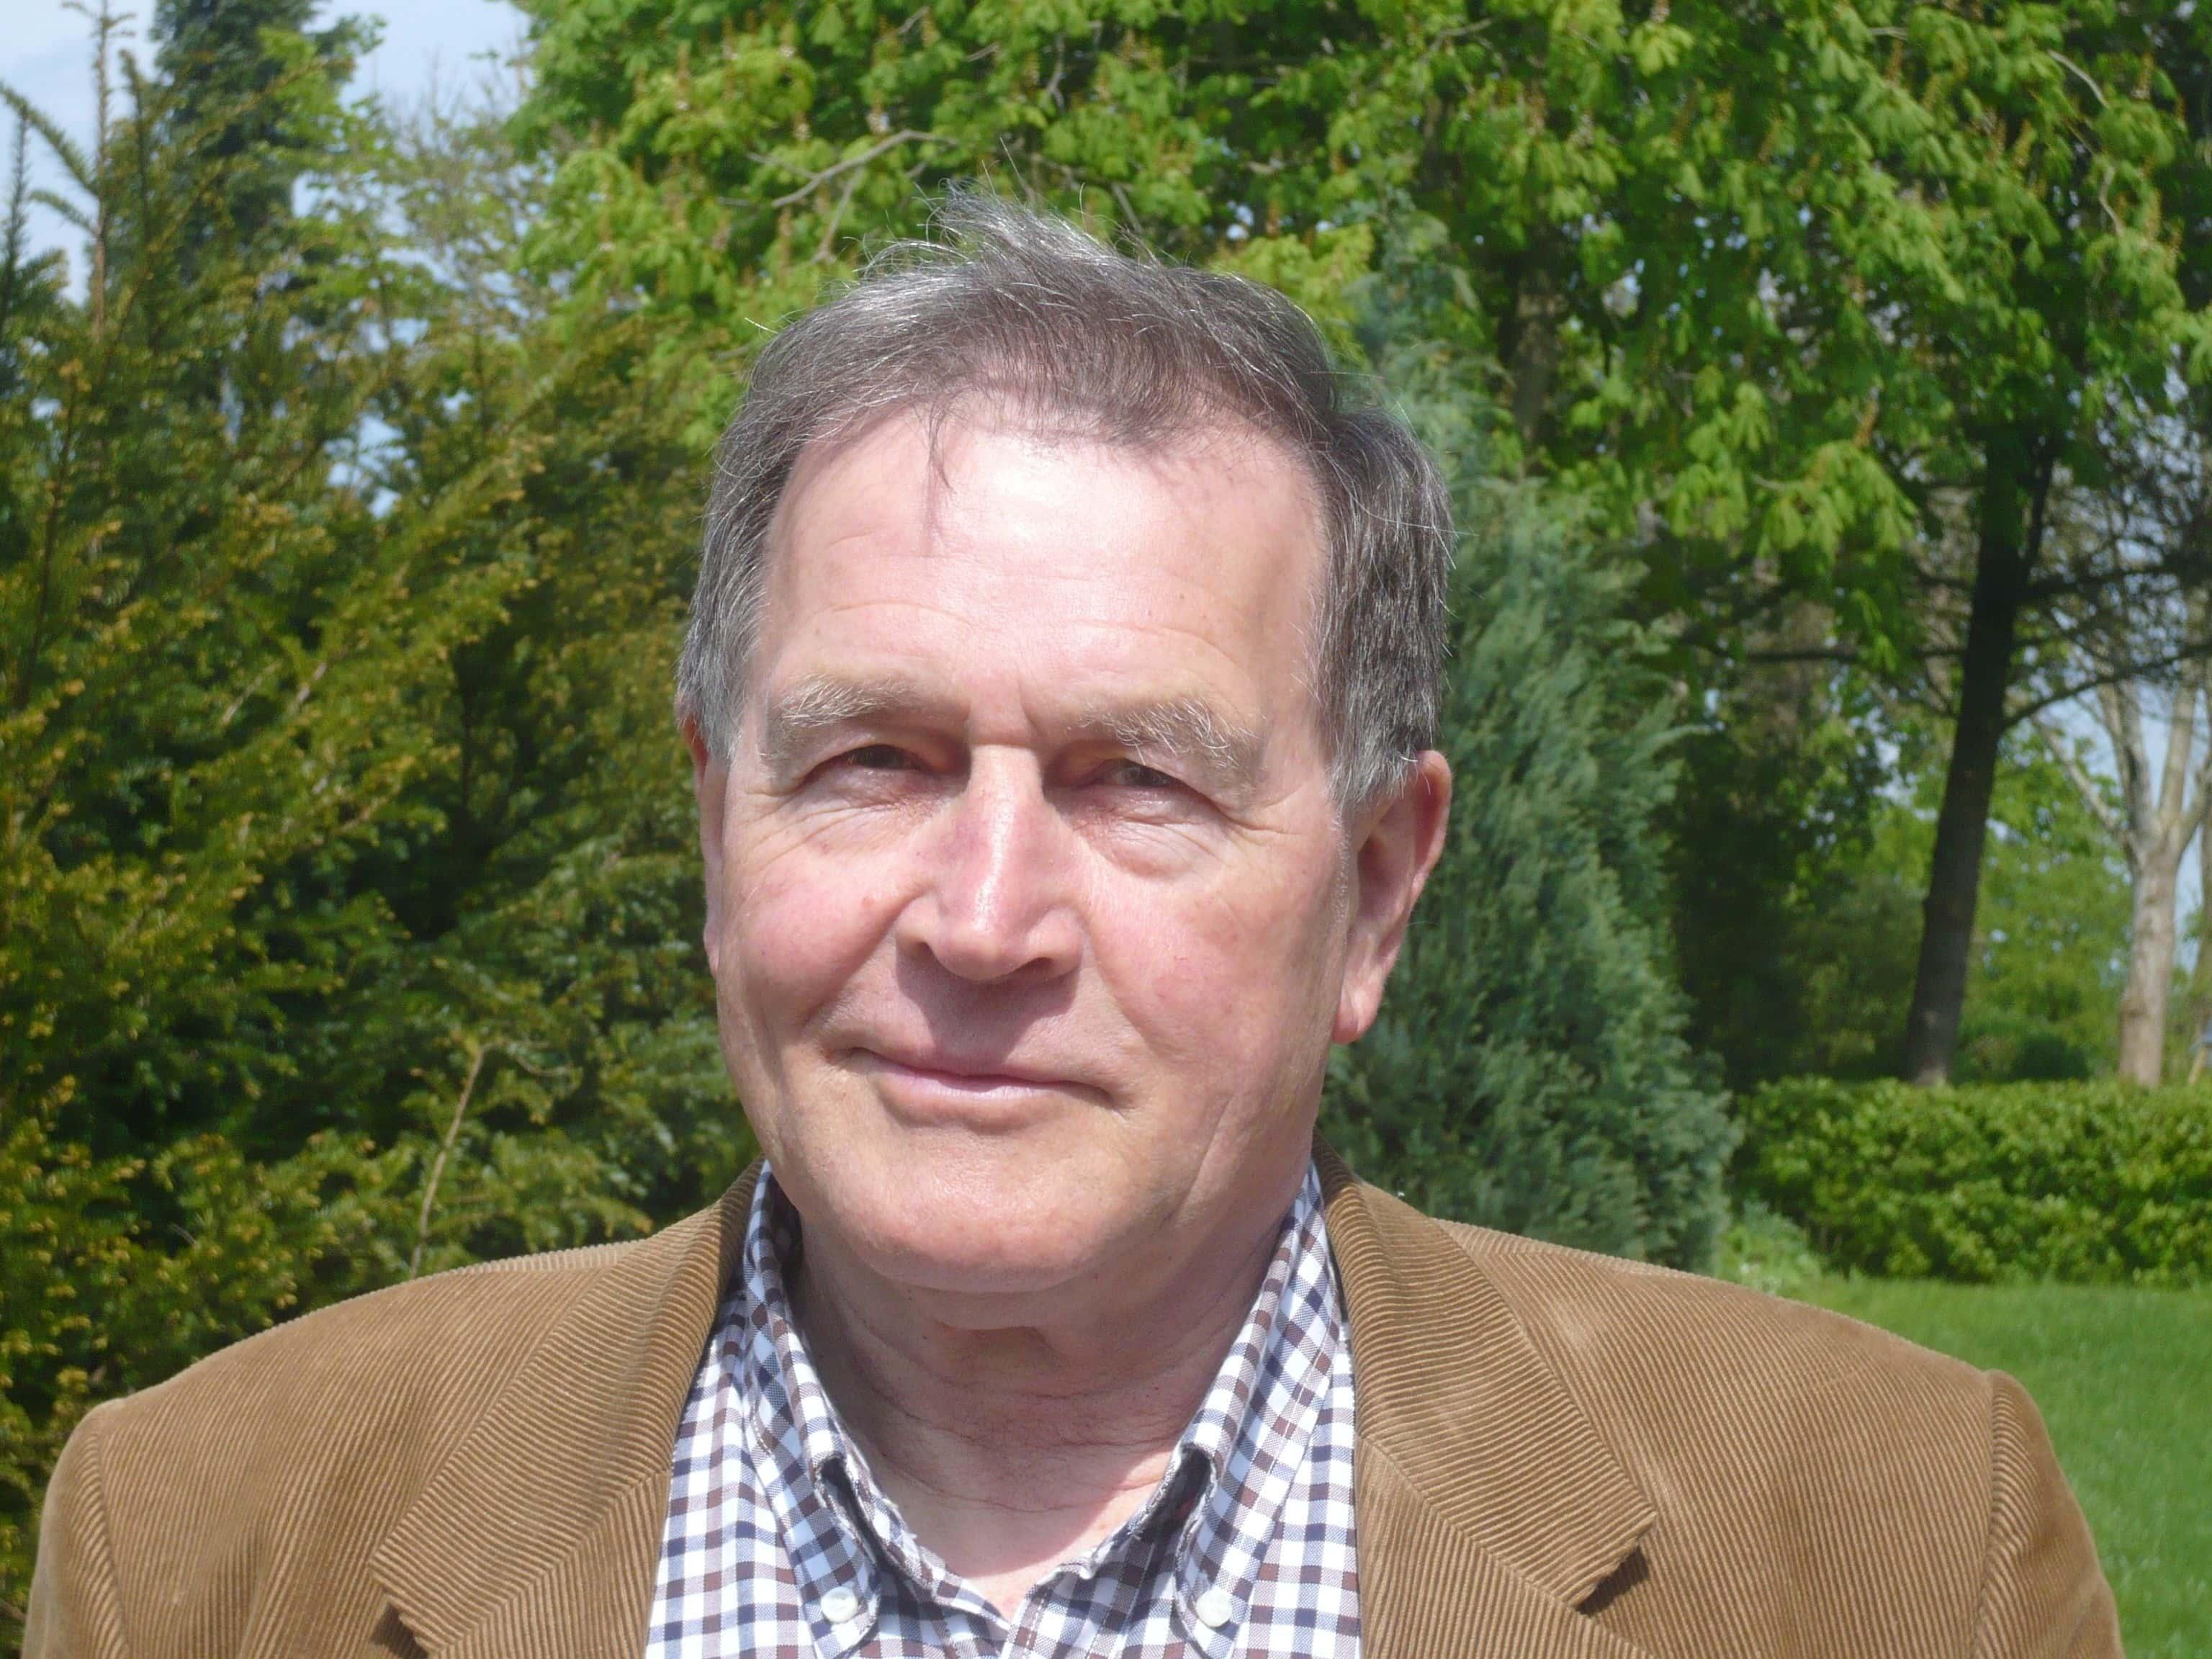 Hans-Werner Berlau, Vorsitzender LAG AktivRegion Schlei-Ostsee e.V.